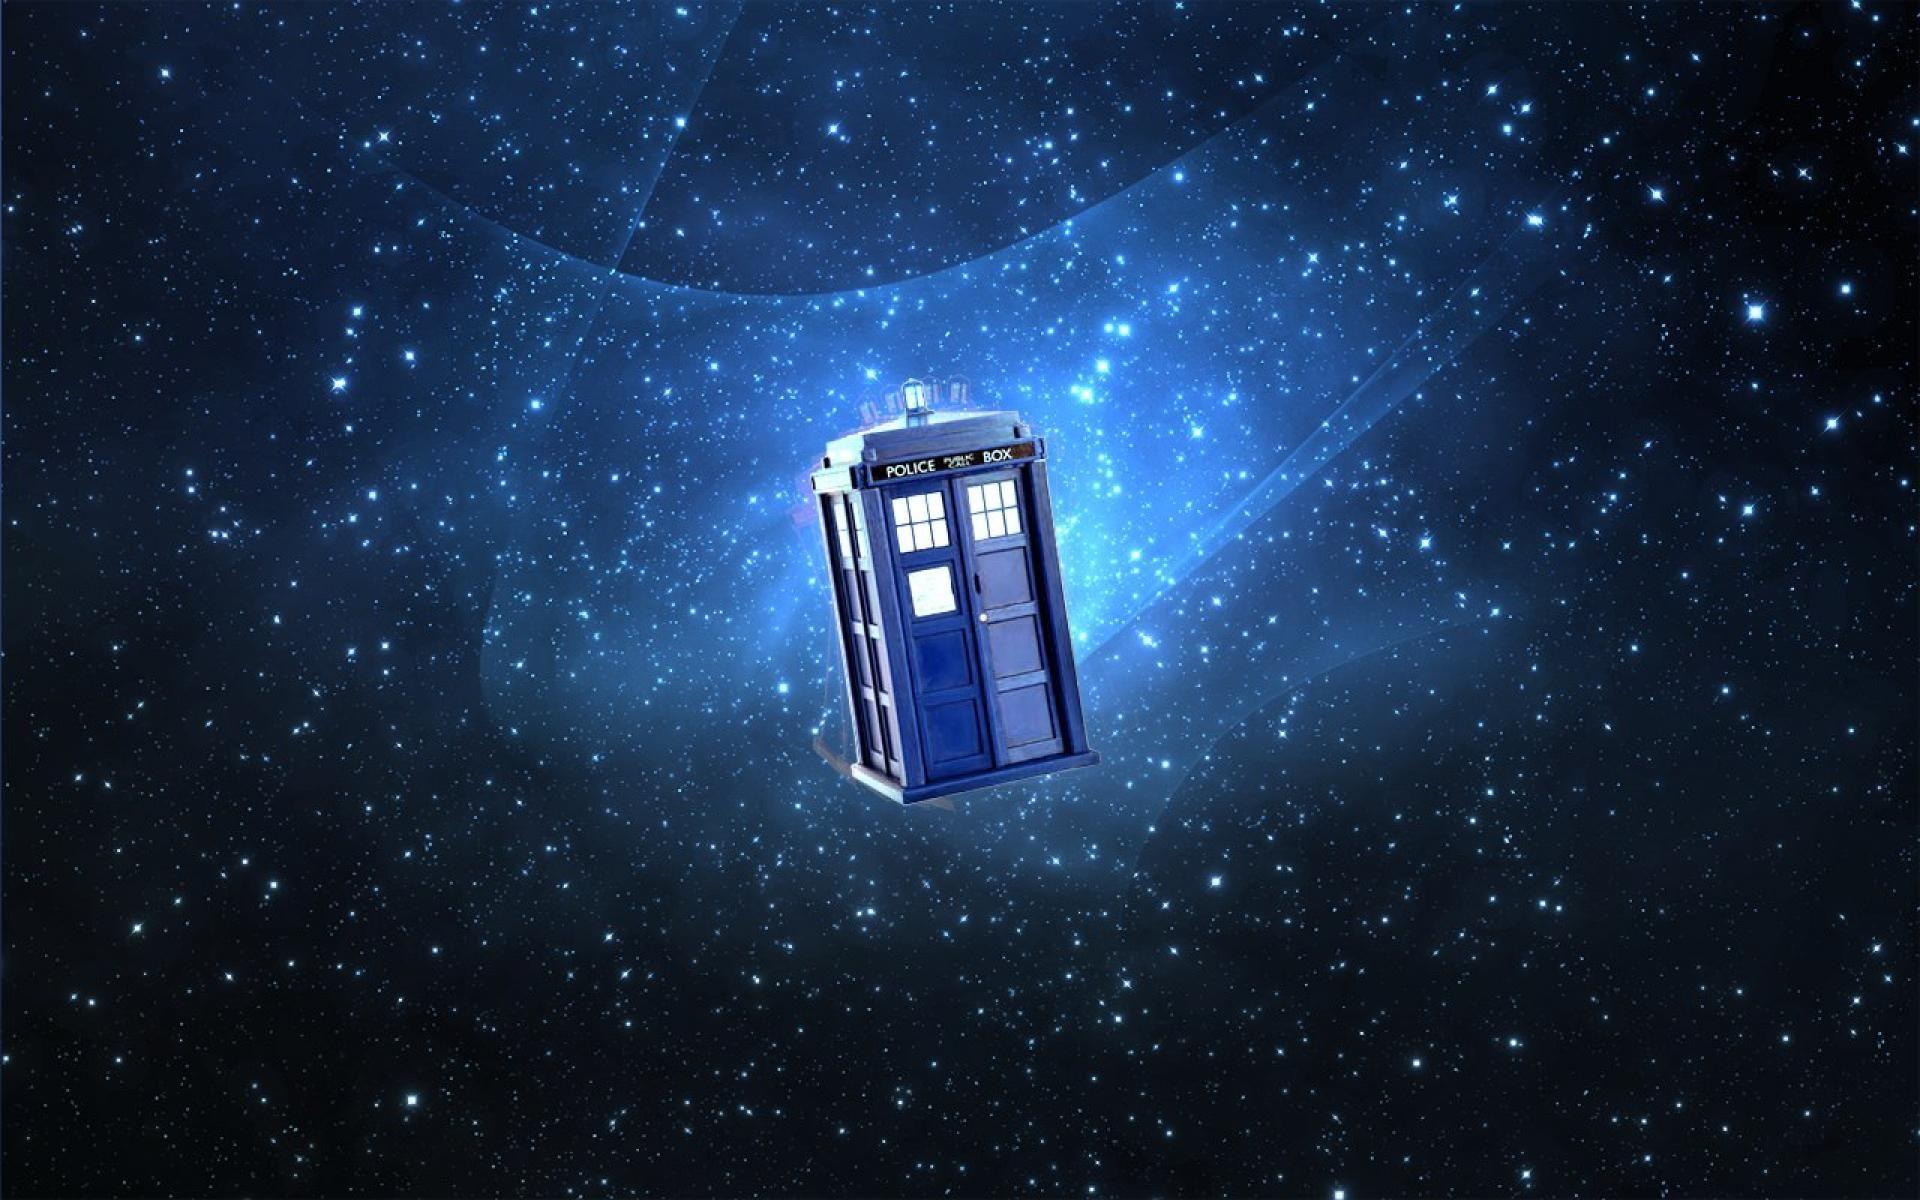 Simple Wallpaper Mac Doctor Who - 12b1f8bb9ff836464eb6c8ede47d69de  Trends_331129.jpg